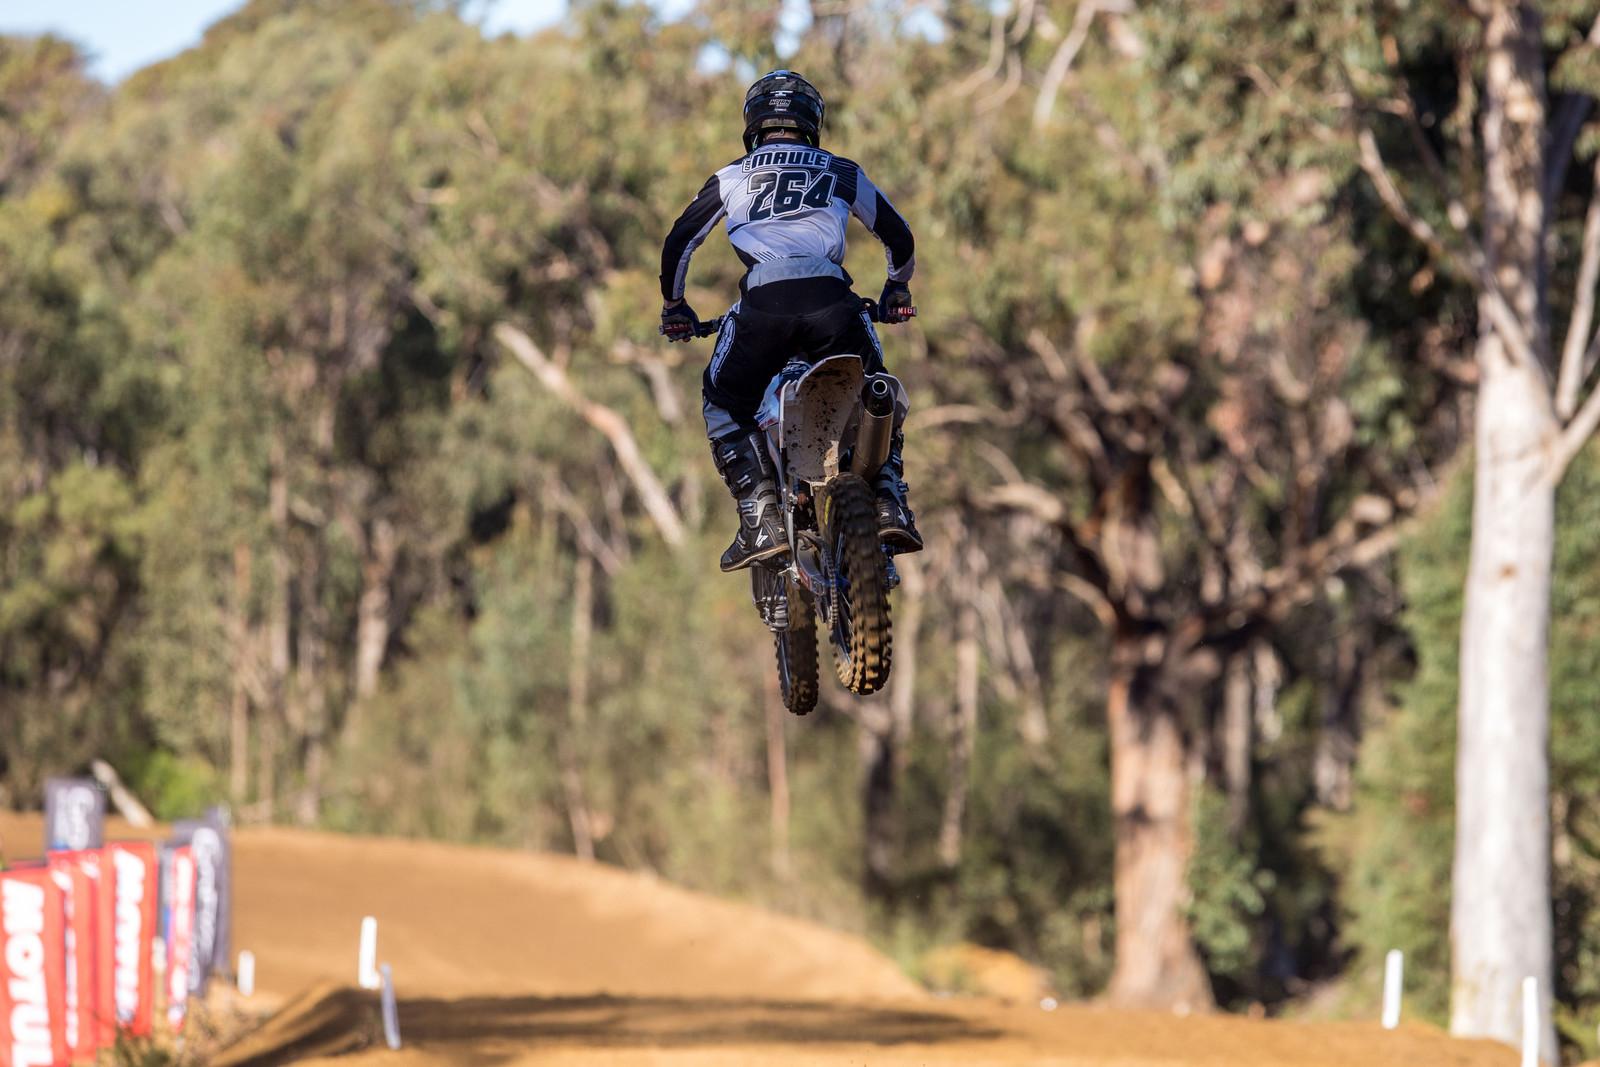 Izak Maule - Australian Motul MX Championships: Round 6, Nowra - Motocross Pictures - Vital MX